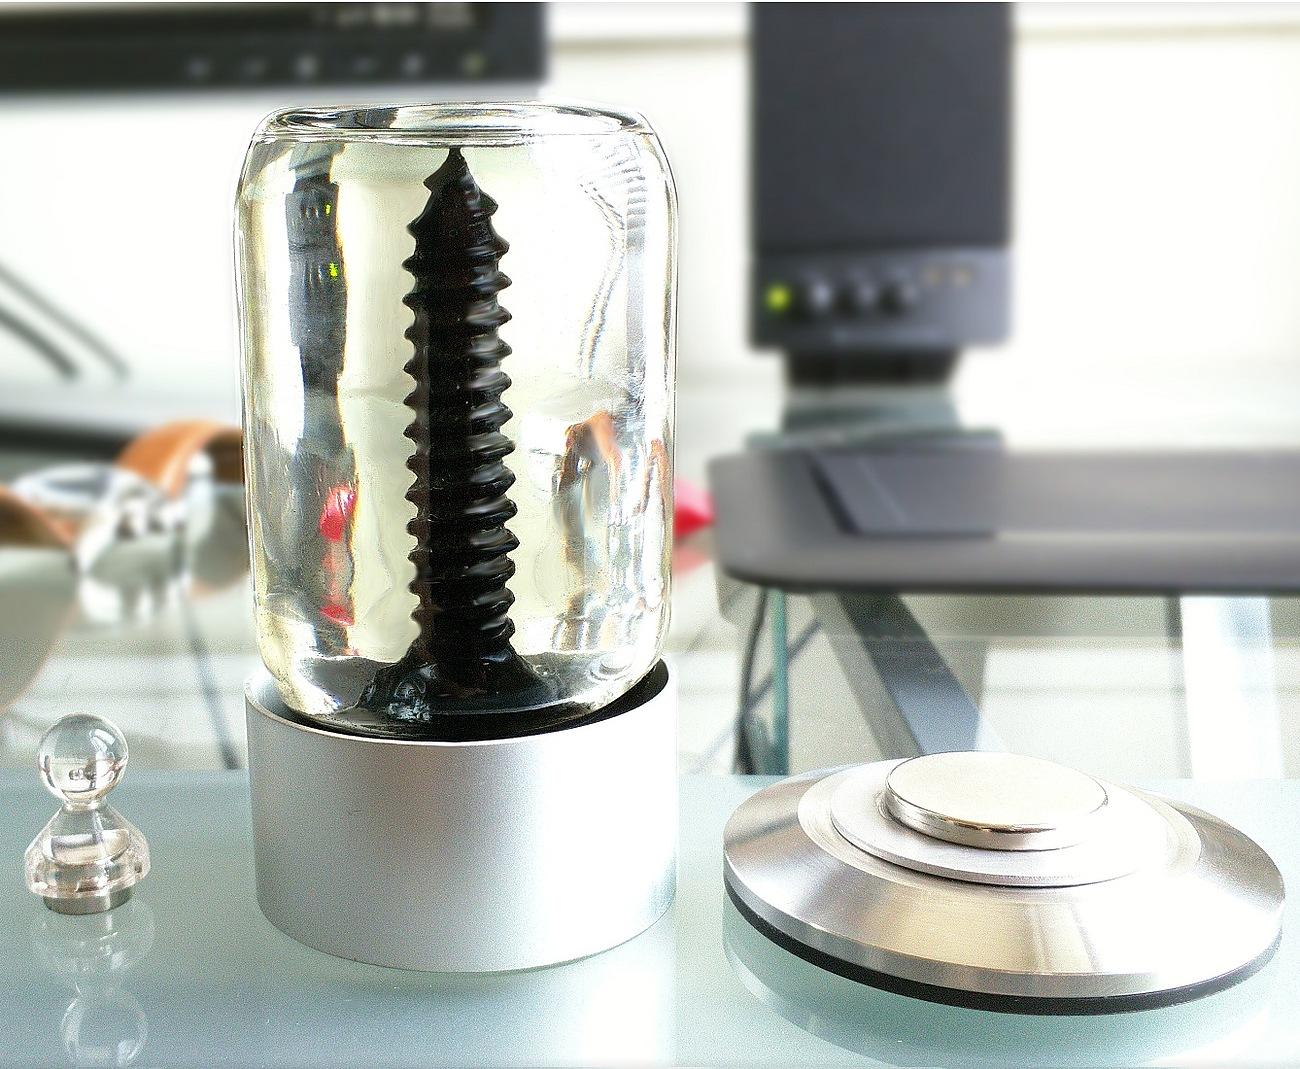 RIZE – Spinning Ferrofluid Display